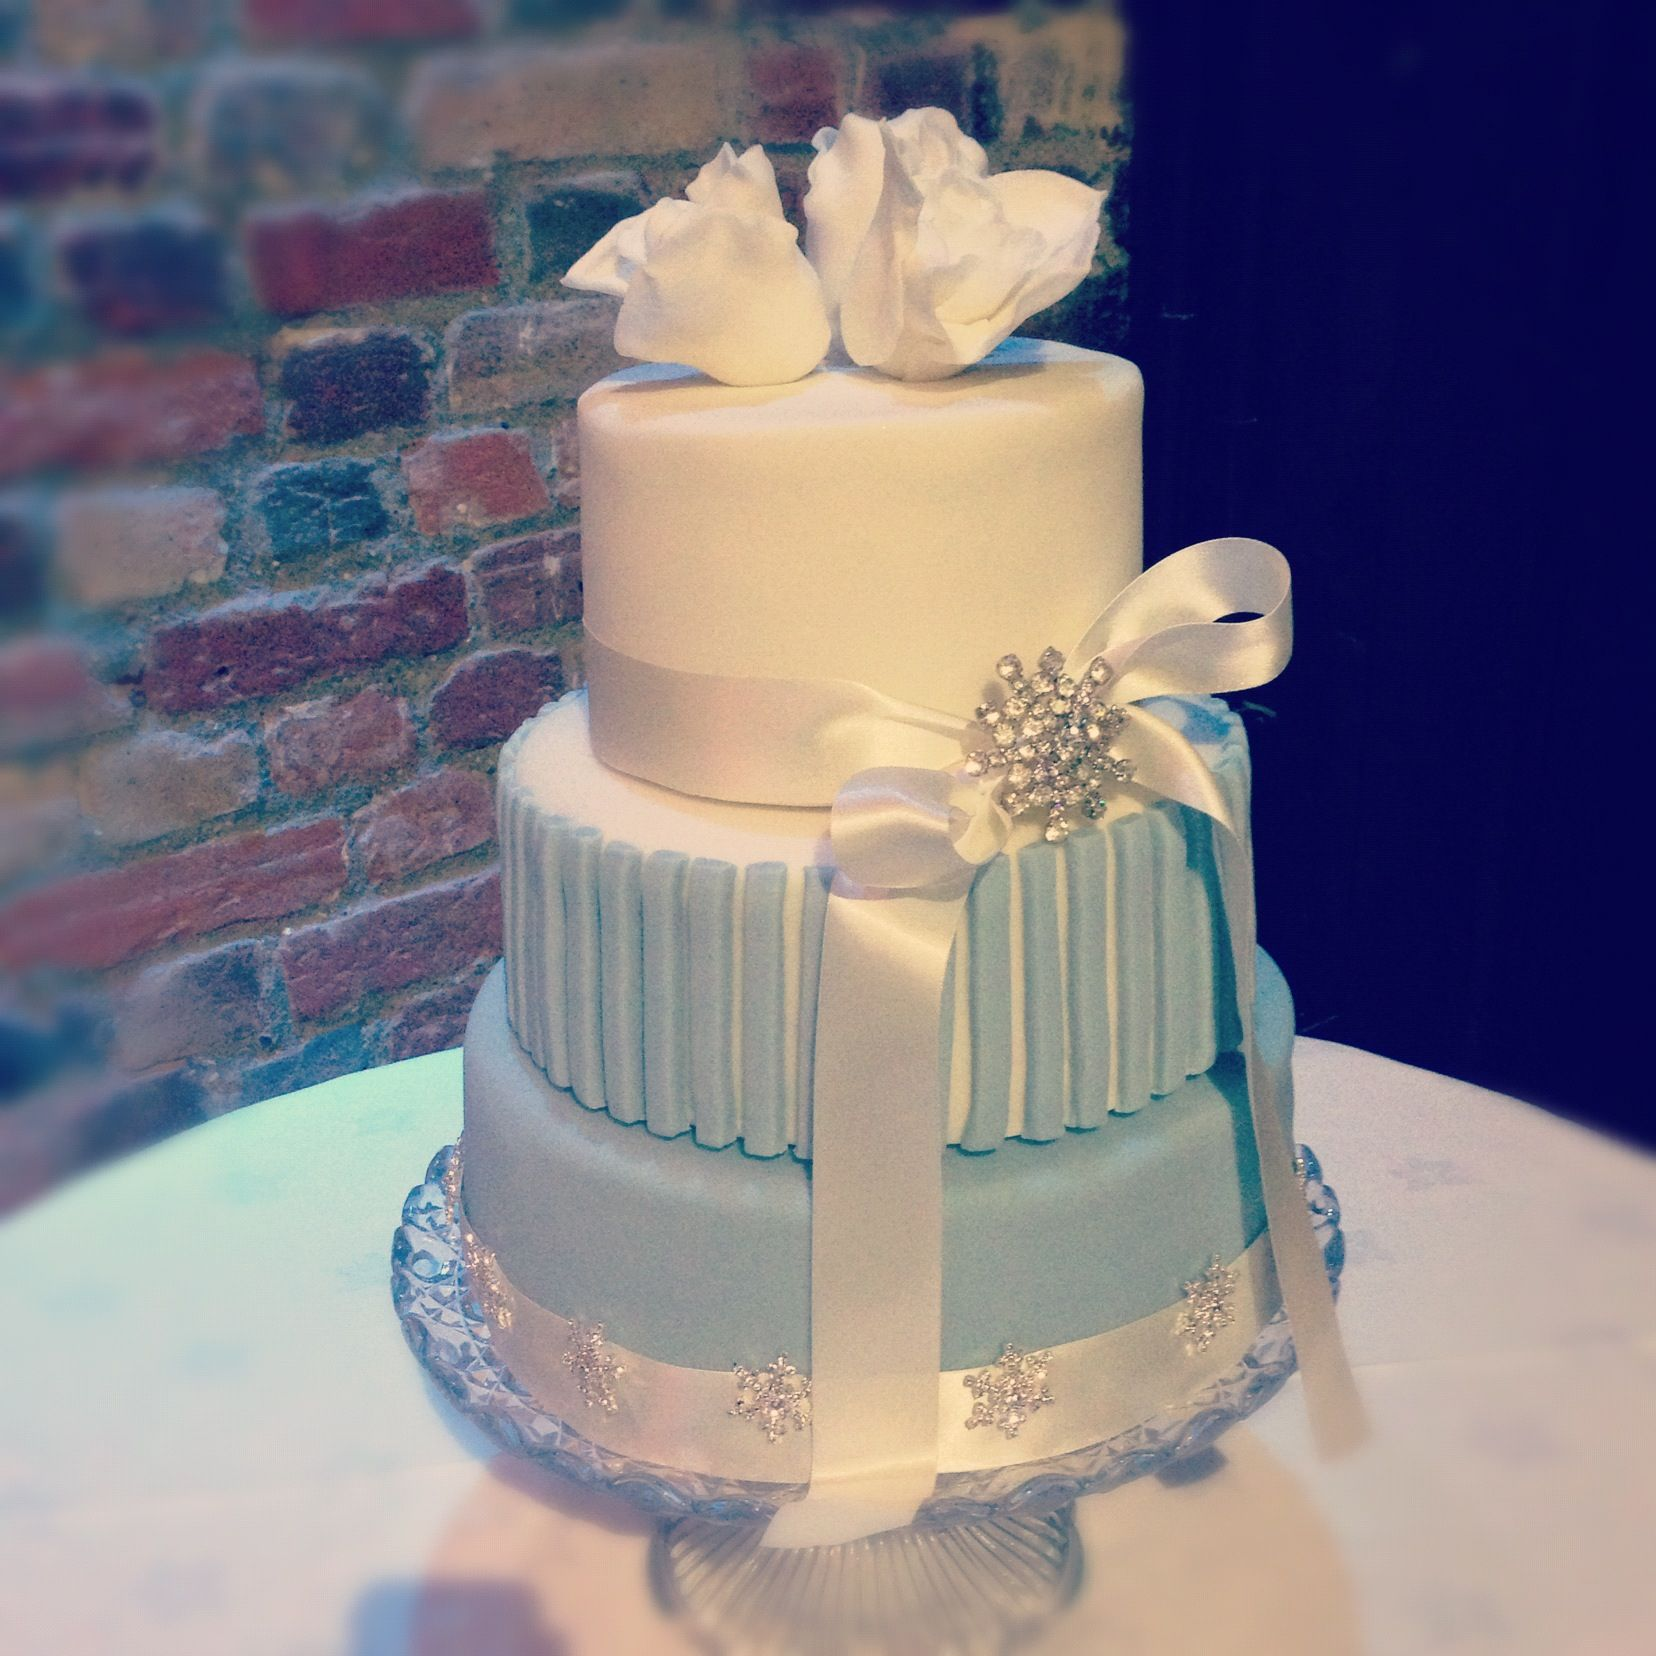 Wedding Cake. Snowflake Winter Wonderland Theme Sweet 16